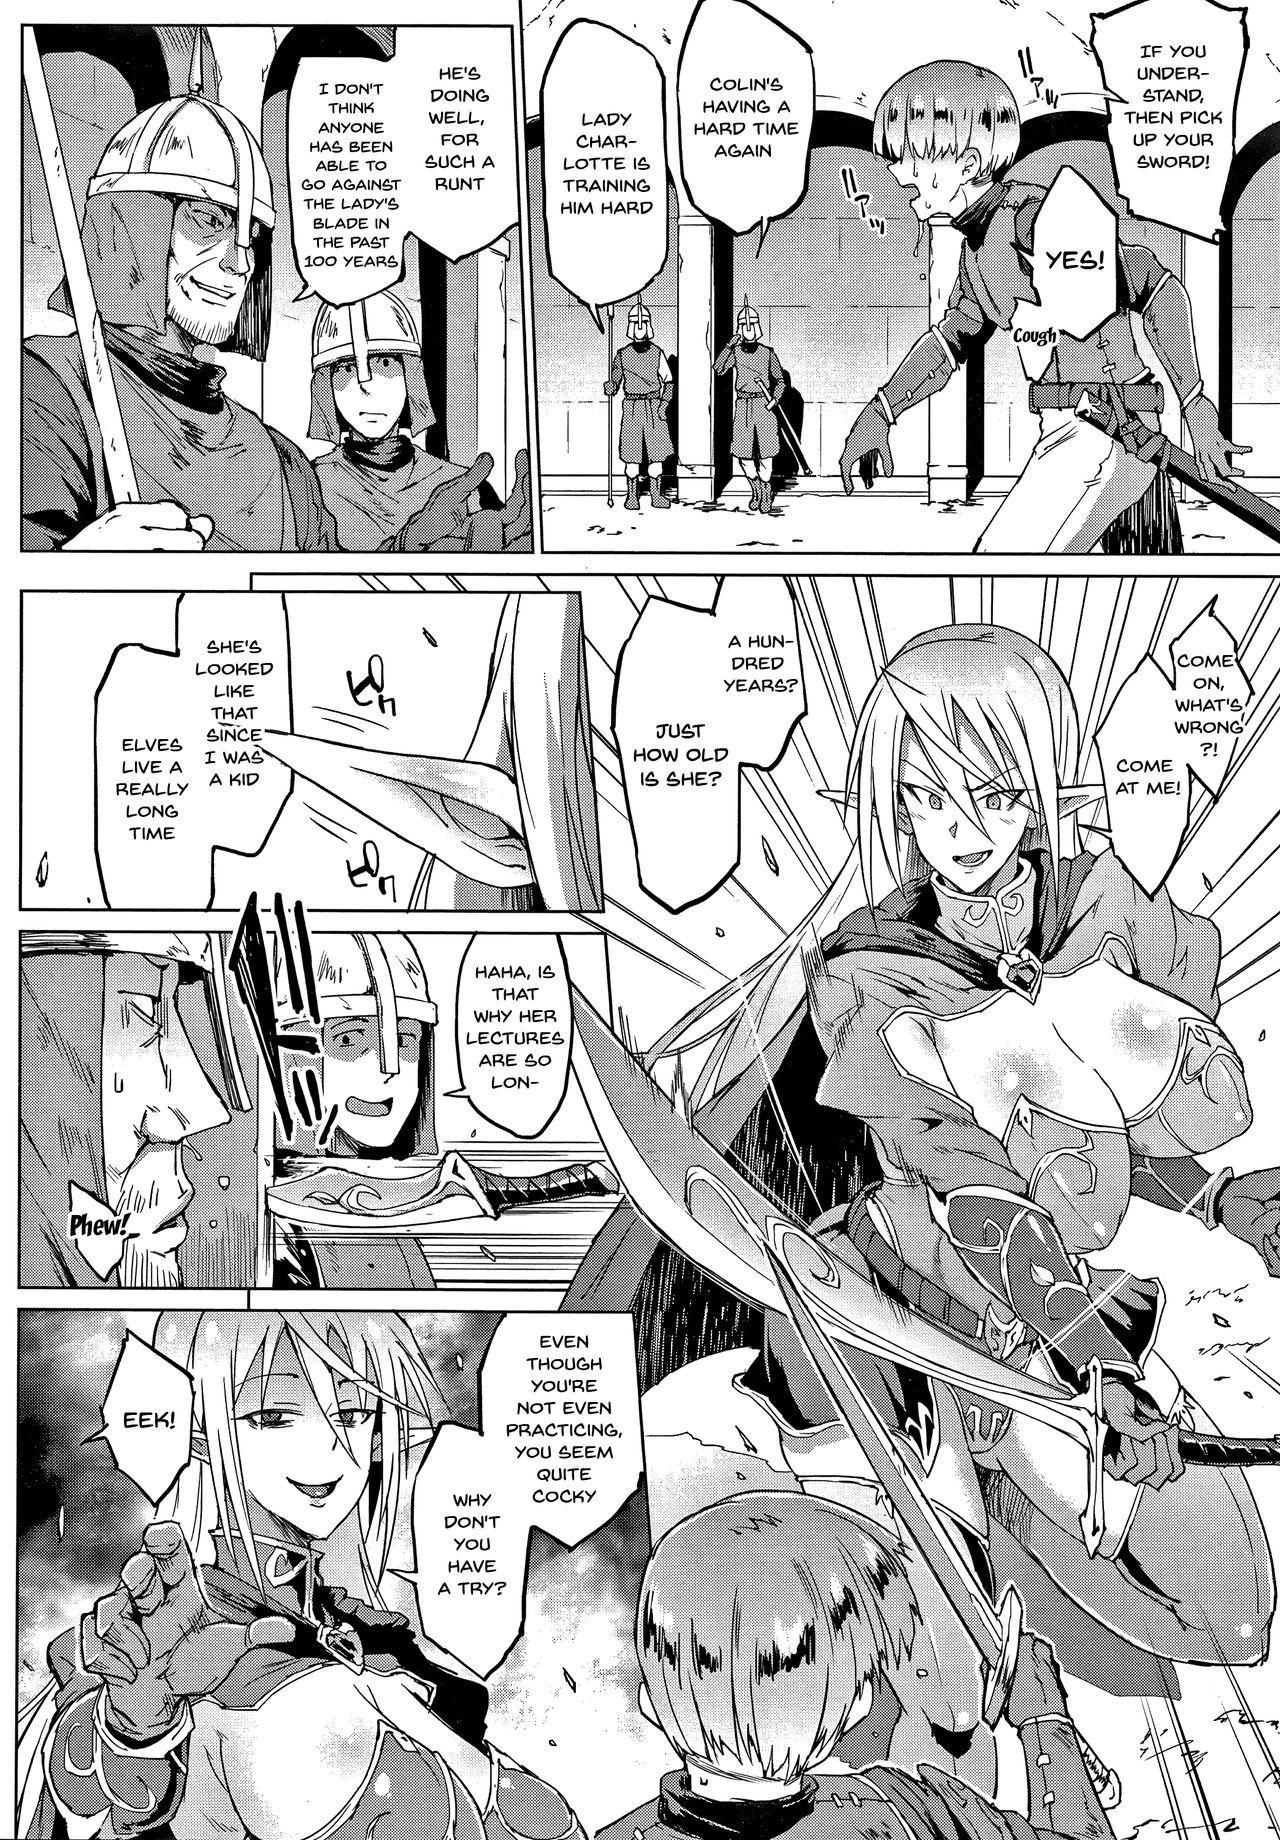 [Fan no Hitori] Sennen Reijou ~ My Lady, My Master ~  Ch.1-2 [English] {Doujins.com} 6